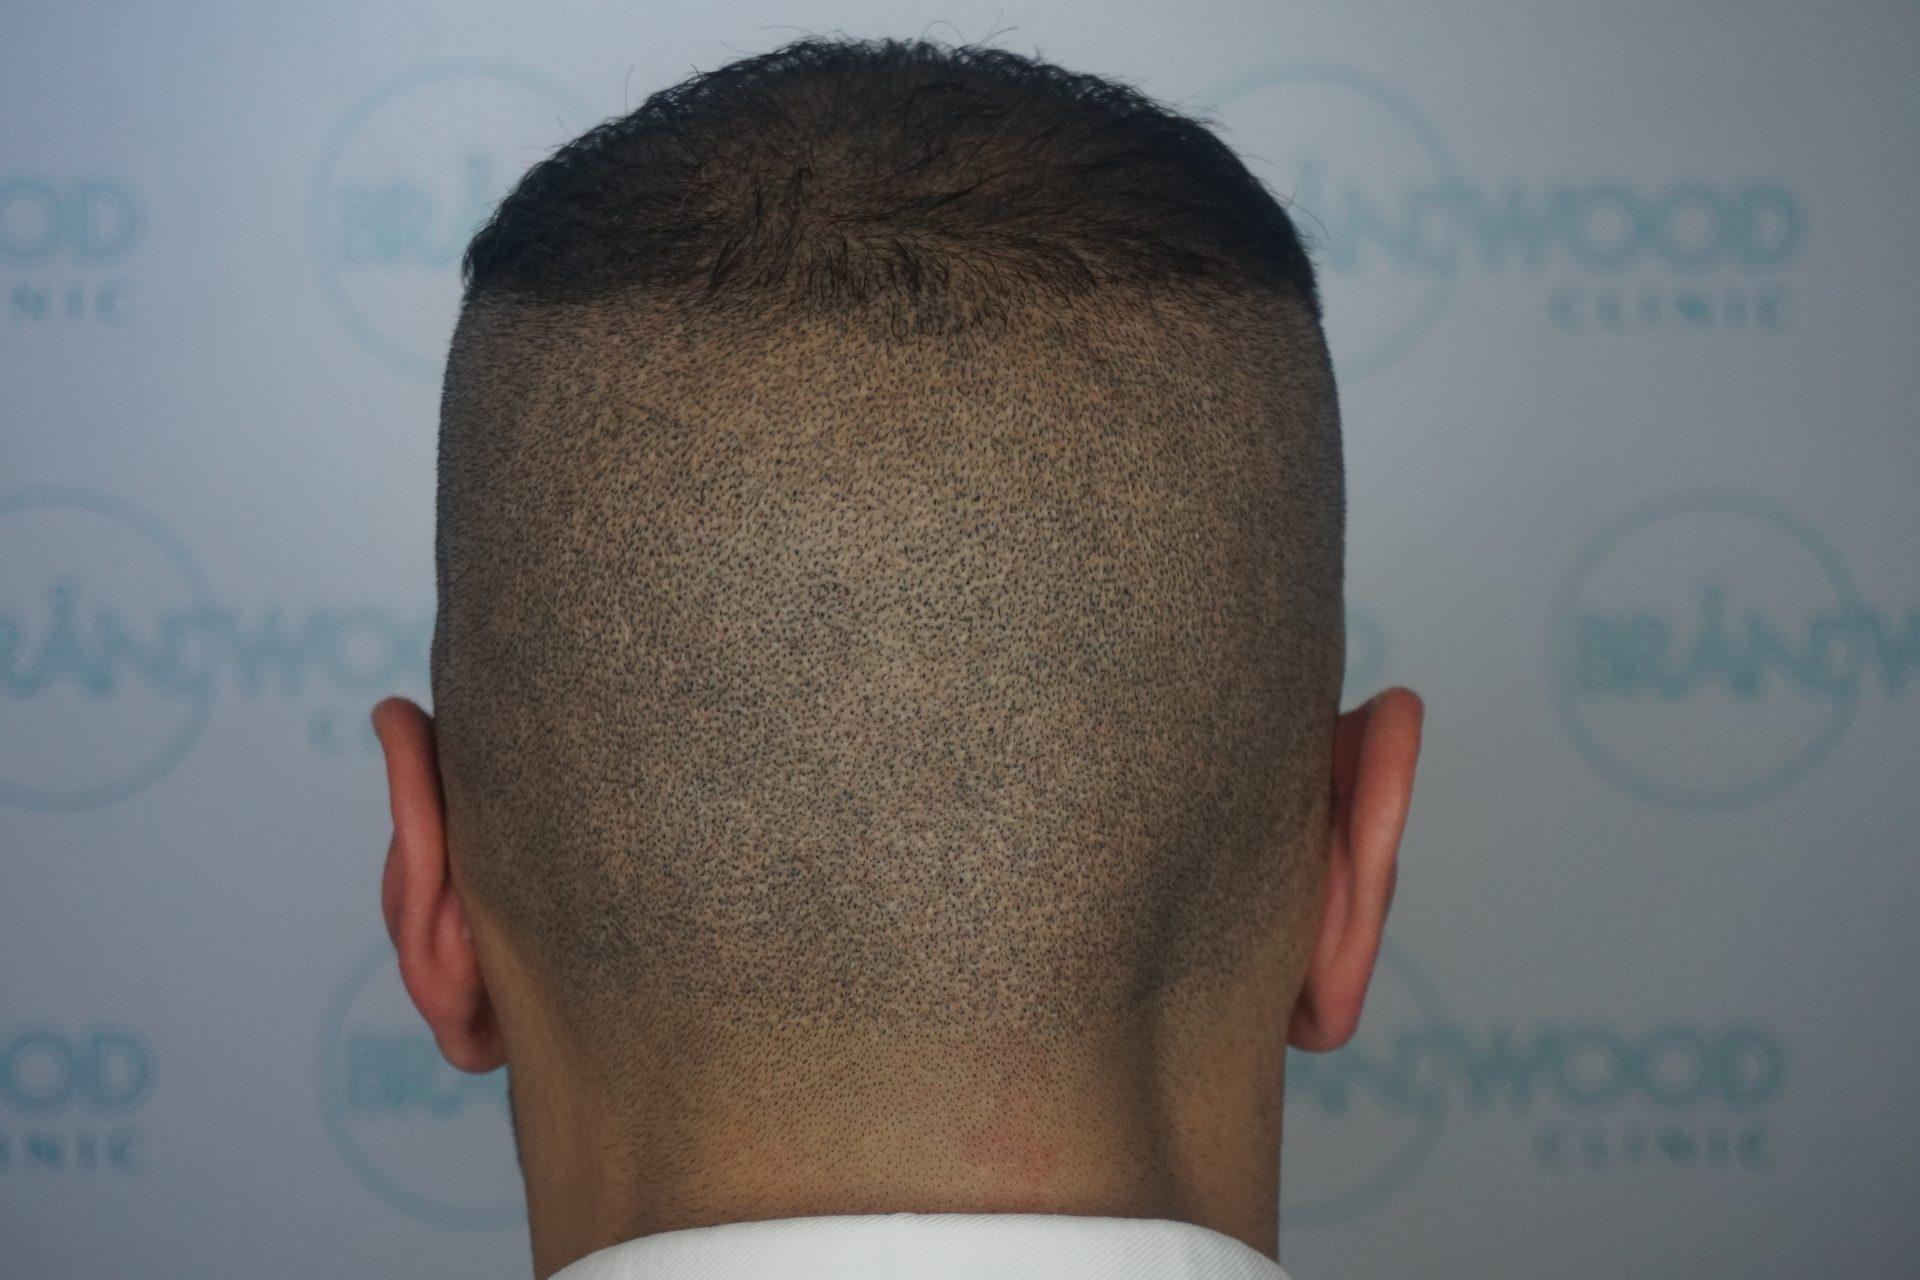 FUE scars Muslim client